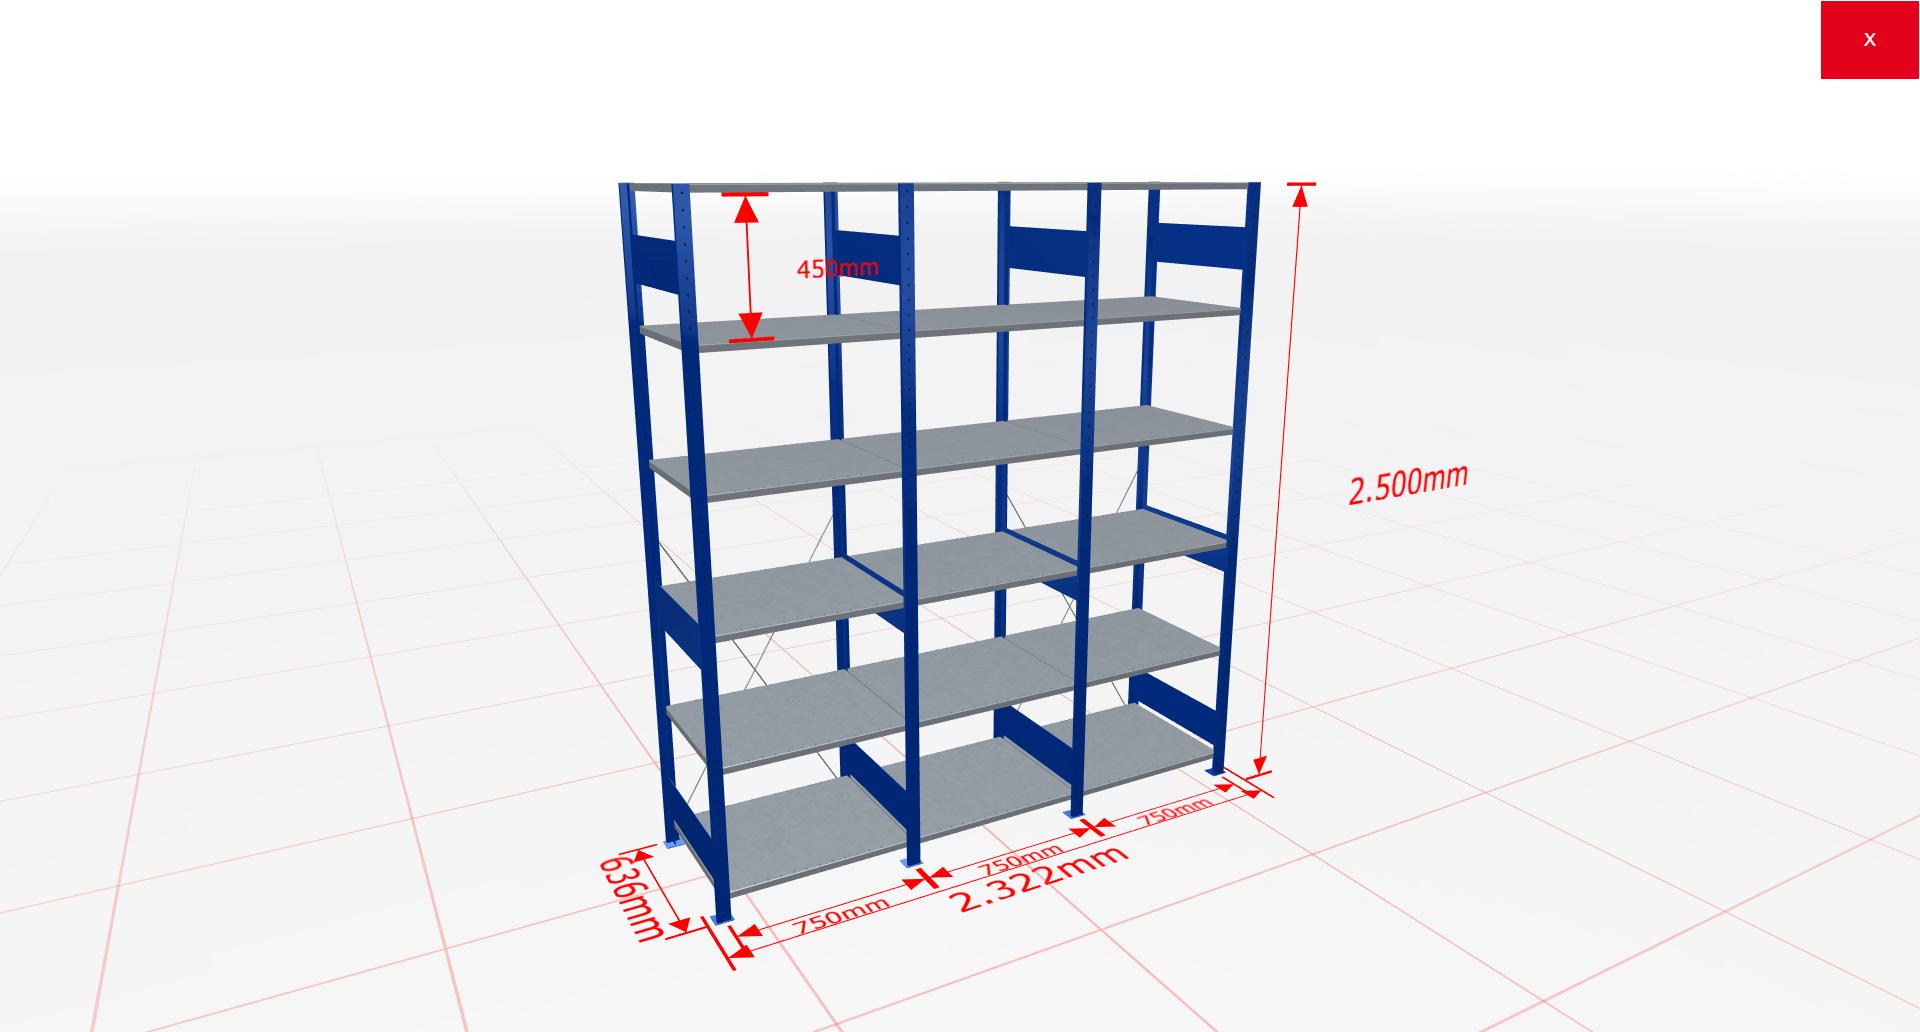 Fachbodenregal Komplettregal 2500x2322x600 mm (HxBxT) SCHULTE Lagertechnik blau 6 Ebenen  150 kg je Boden